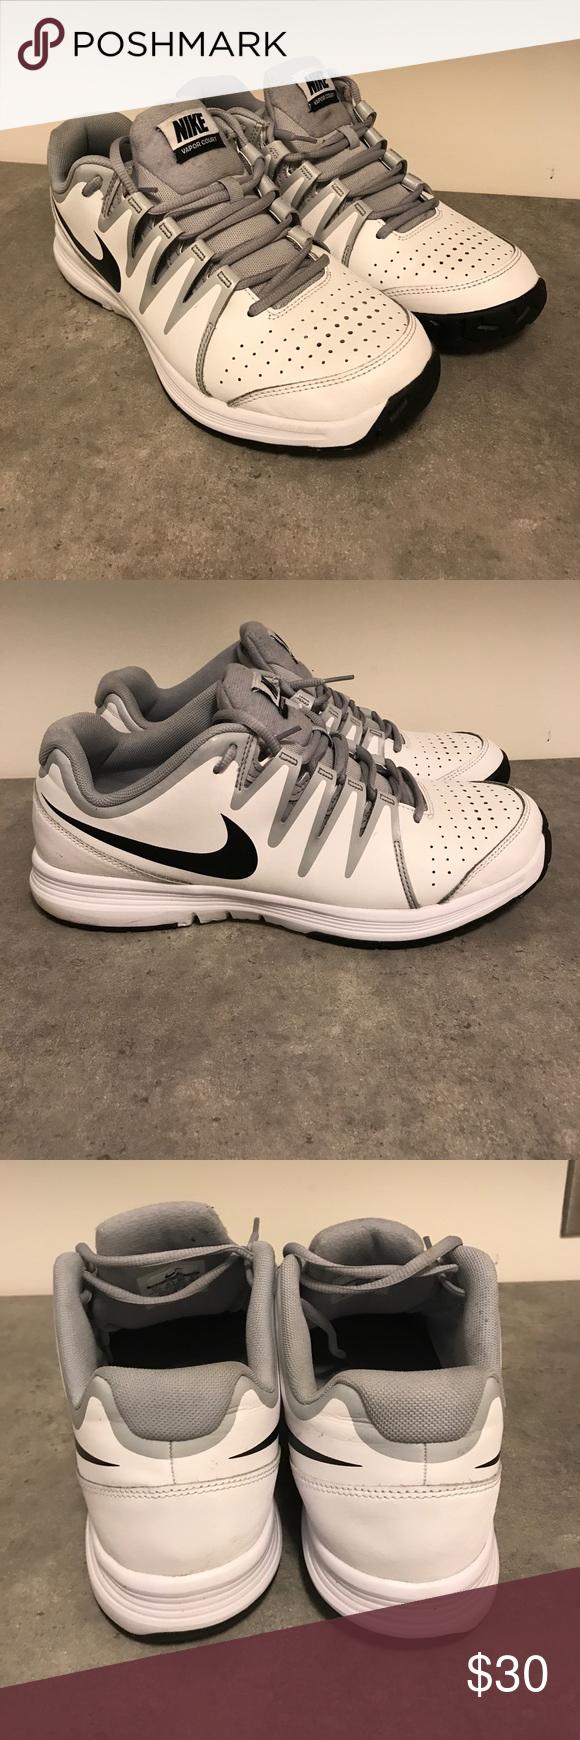 Nike Vaporcourt Tennis Shoes Men S Nike Vapor Court Tennis Shoe For The Tennis Player Who Enjoys A Lightweight Ride With A Na Shoes Mens Tennis Shoes Nike Men